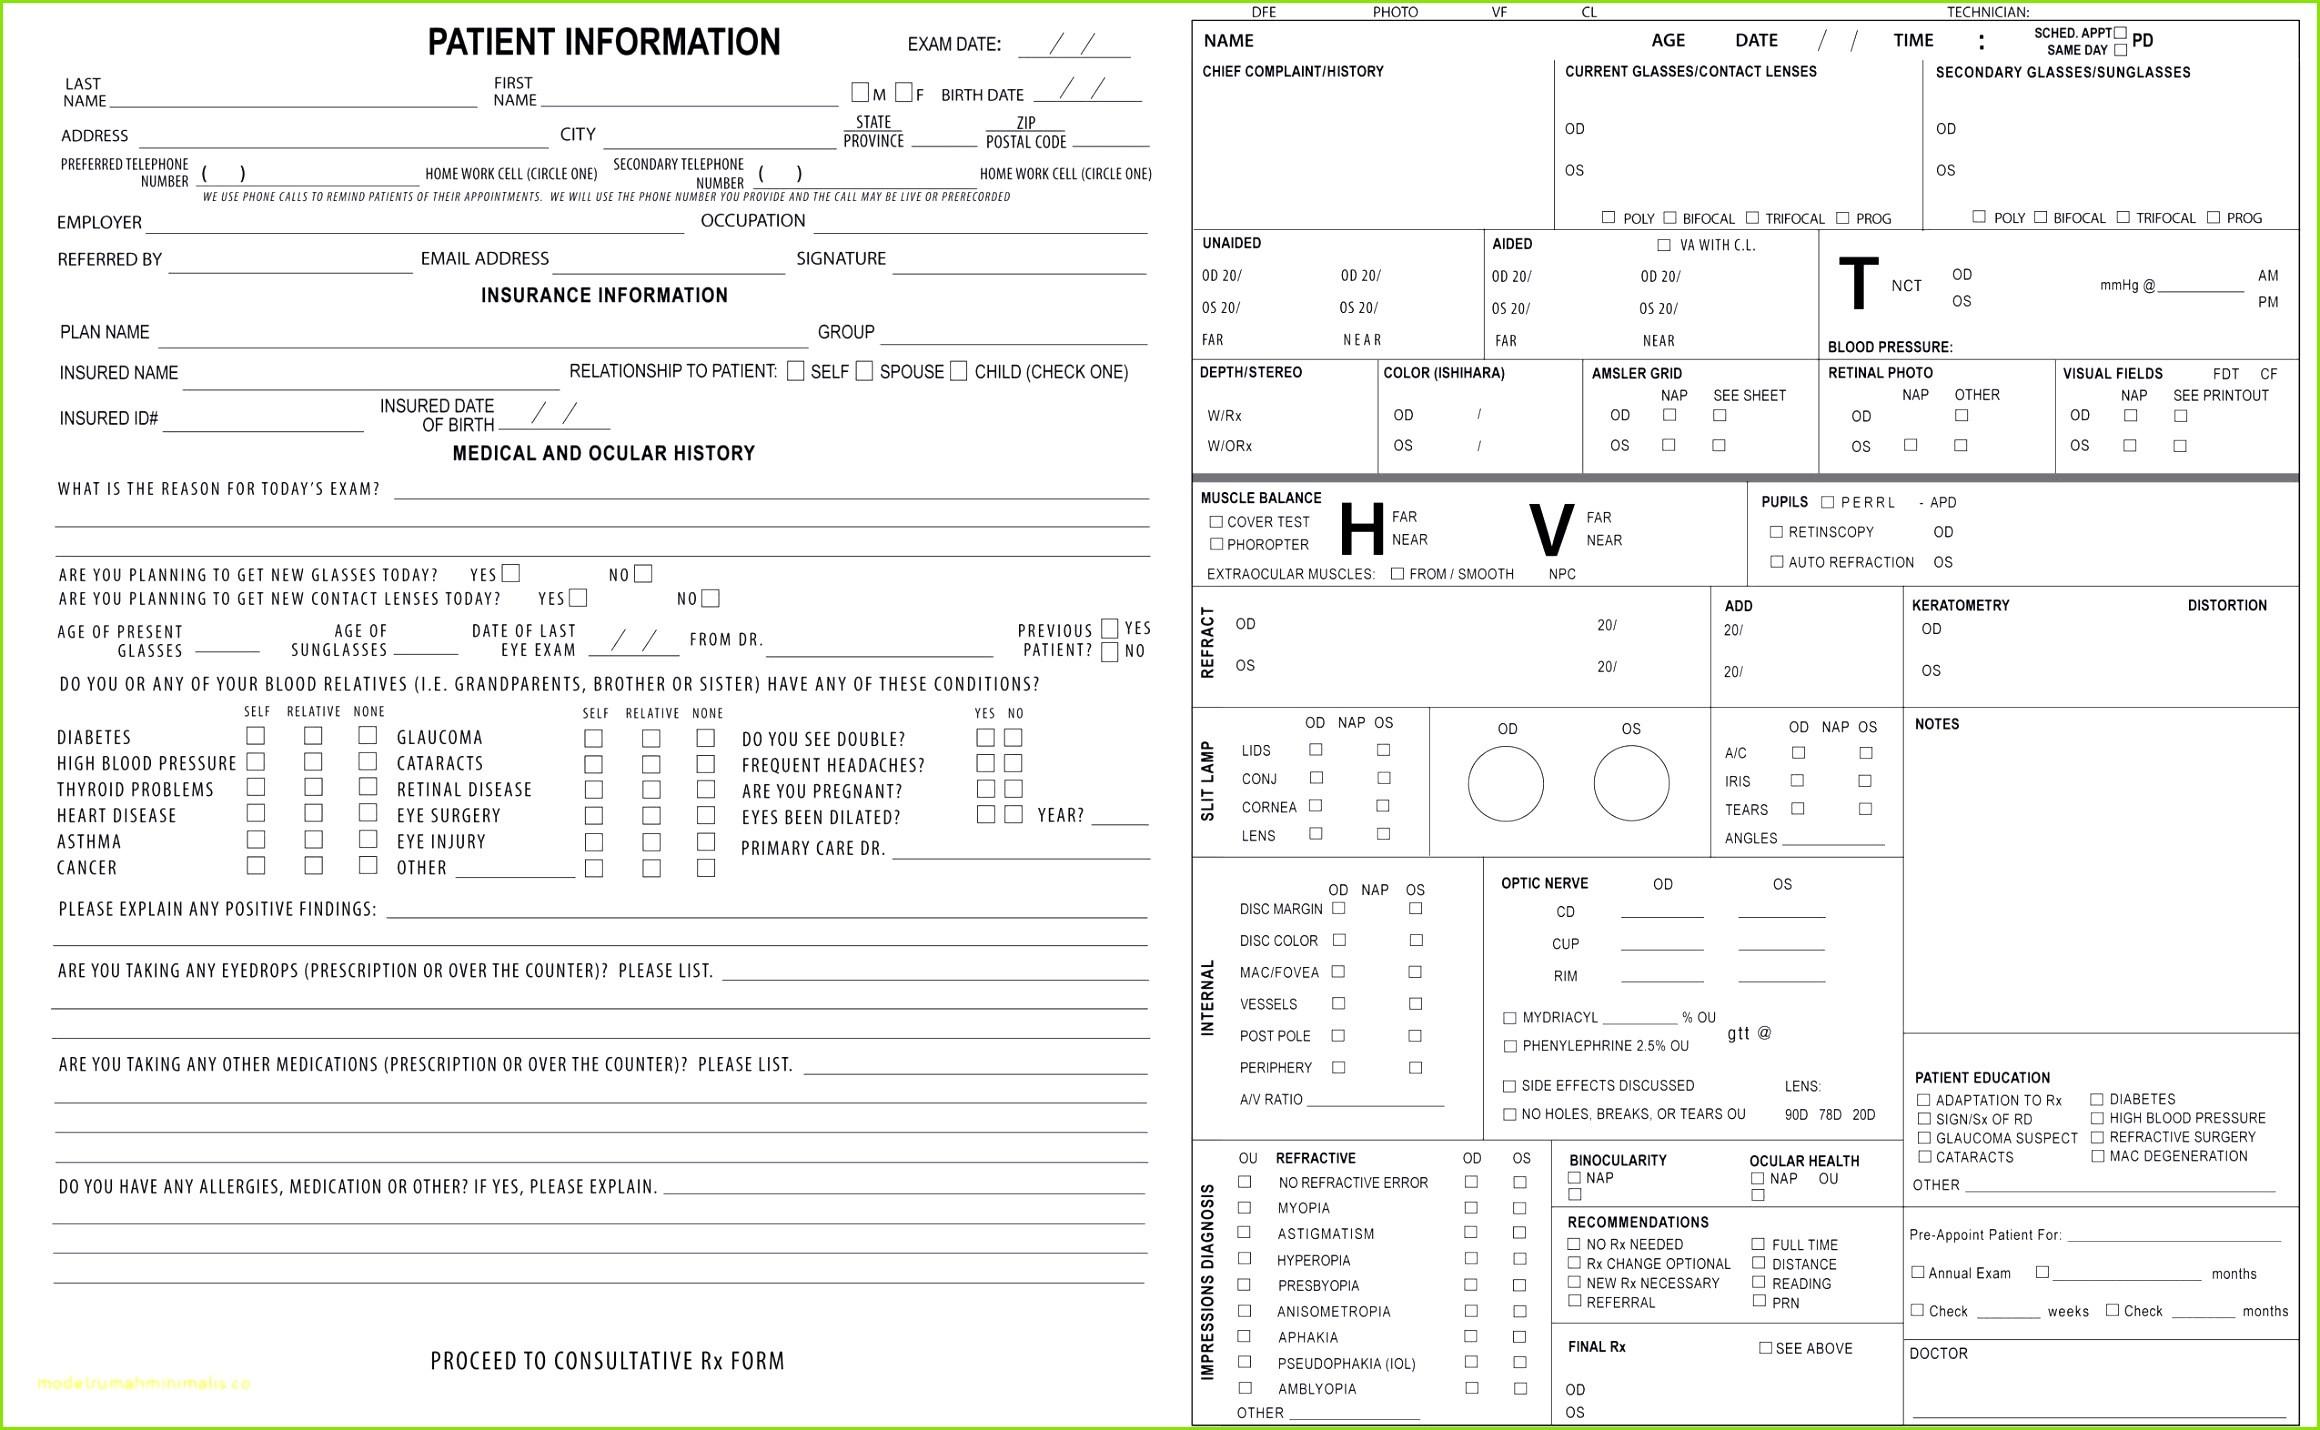 avery label template 30 per page  5 Versandetikett Vorlage 60177 | MelTemplates - avery label template 30 per page